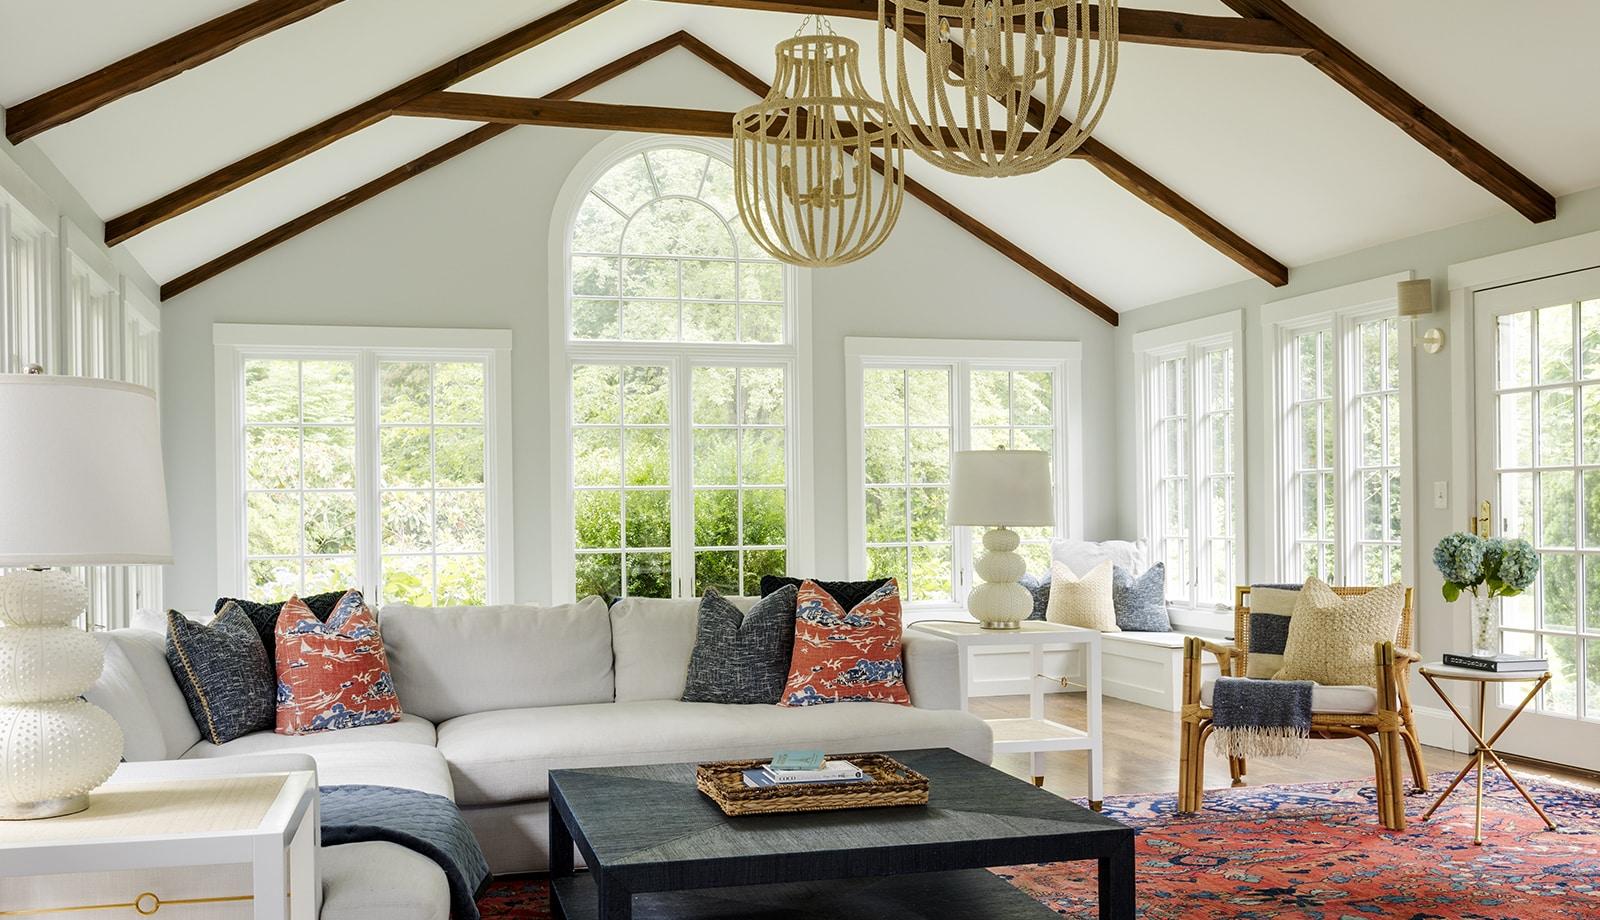 Asian Garden Home Hamilton MA Living Room featured